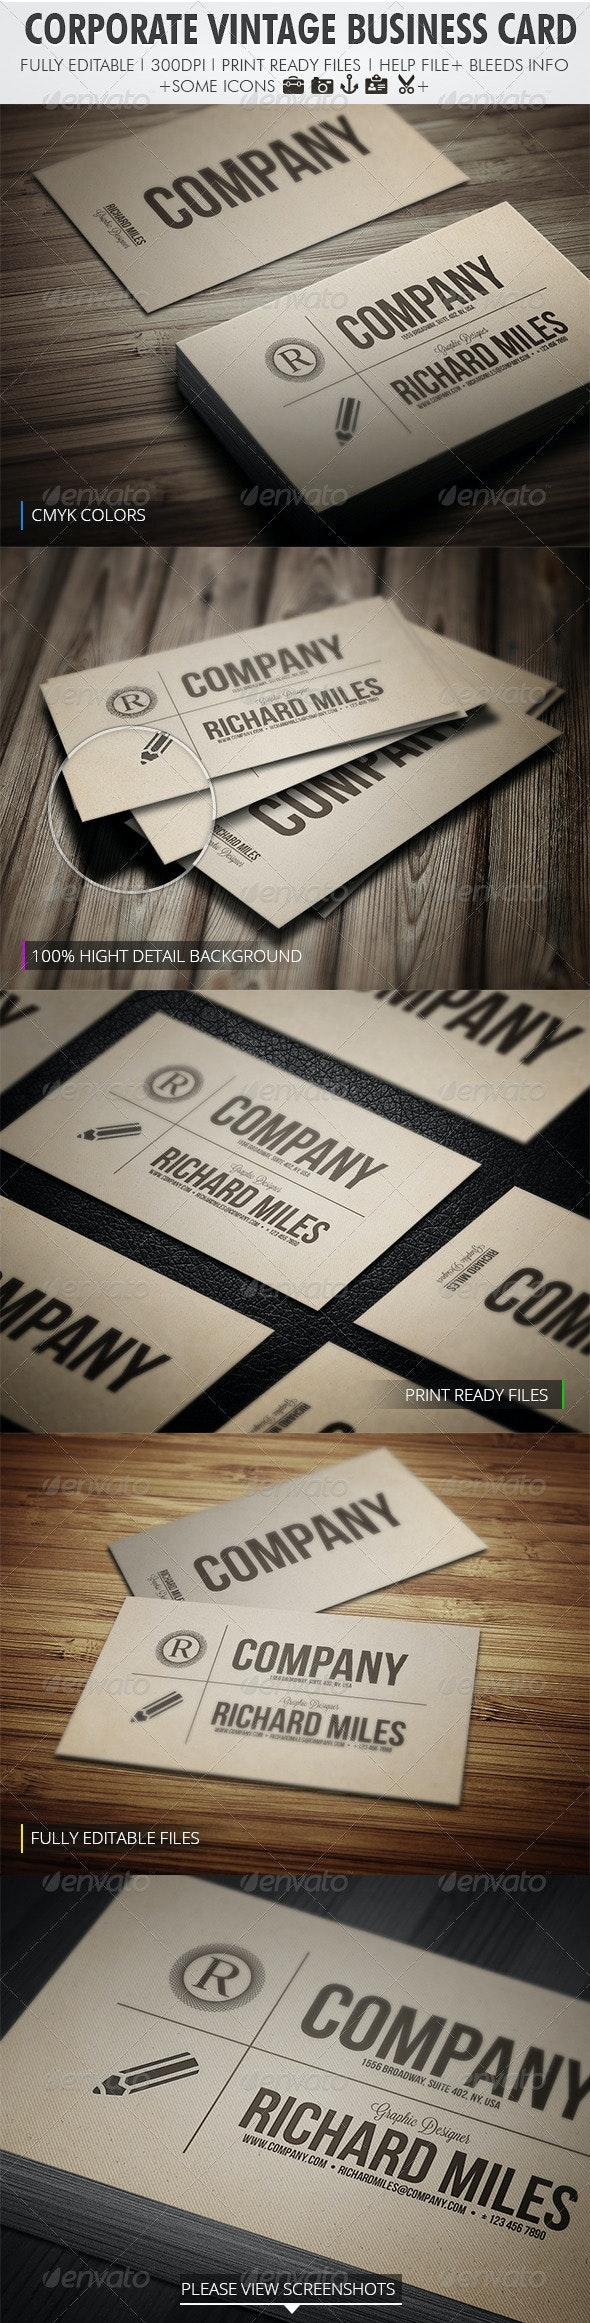 Corporate Vintage Business Card - Retro/Vintage Business Cards